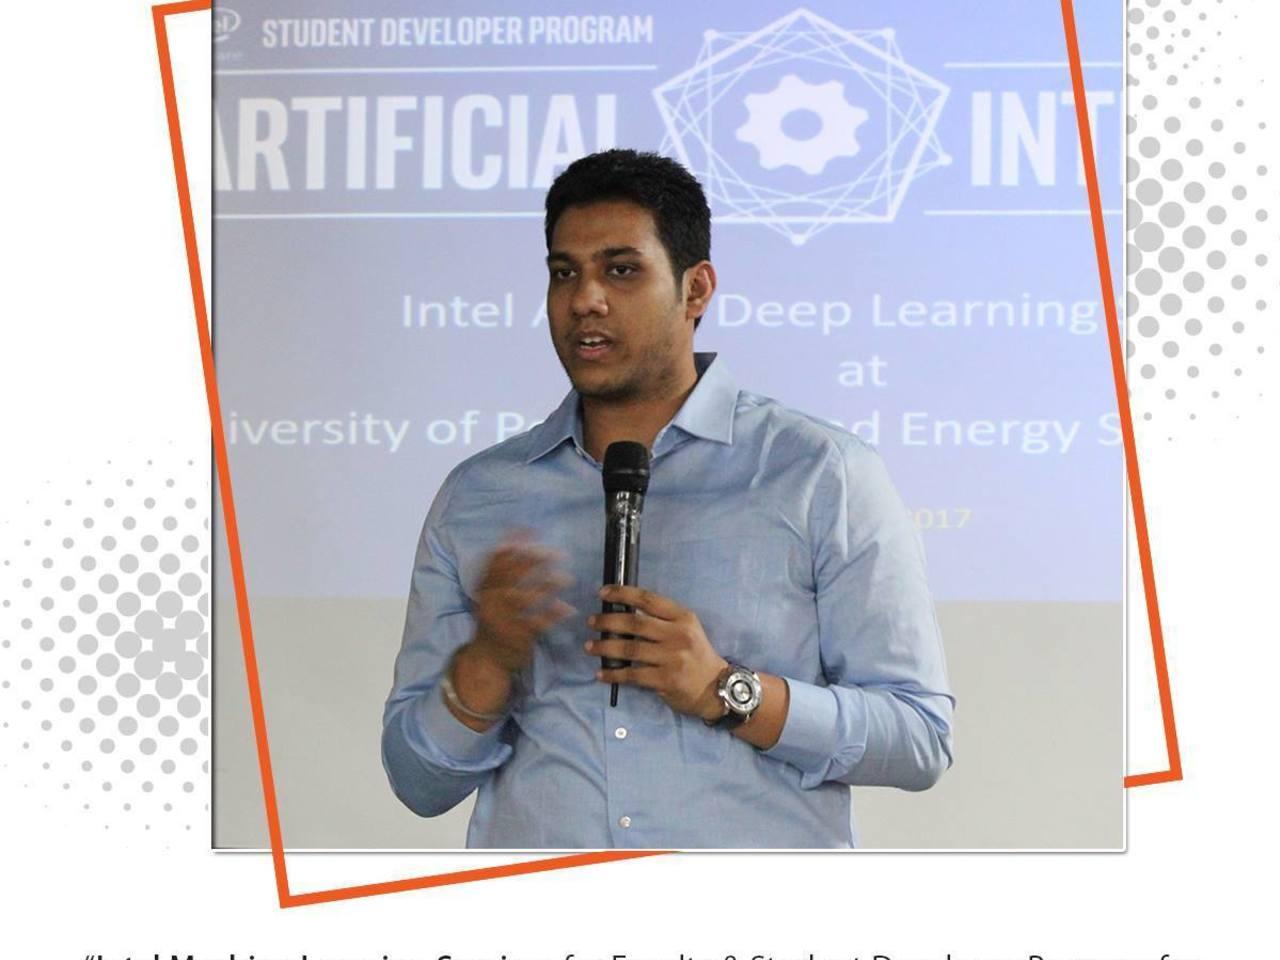 Intel Student Developer Program and Intel Student Ambassador Program